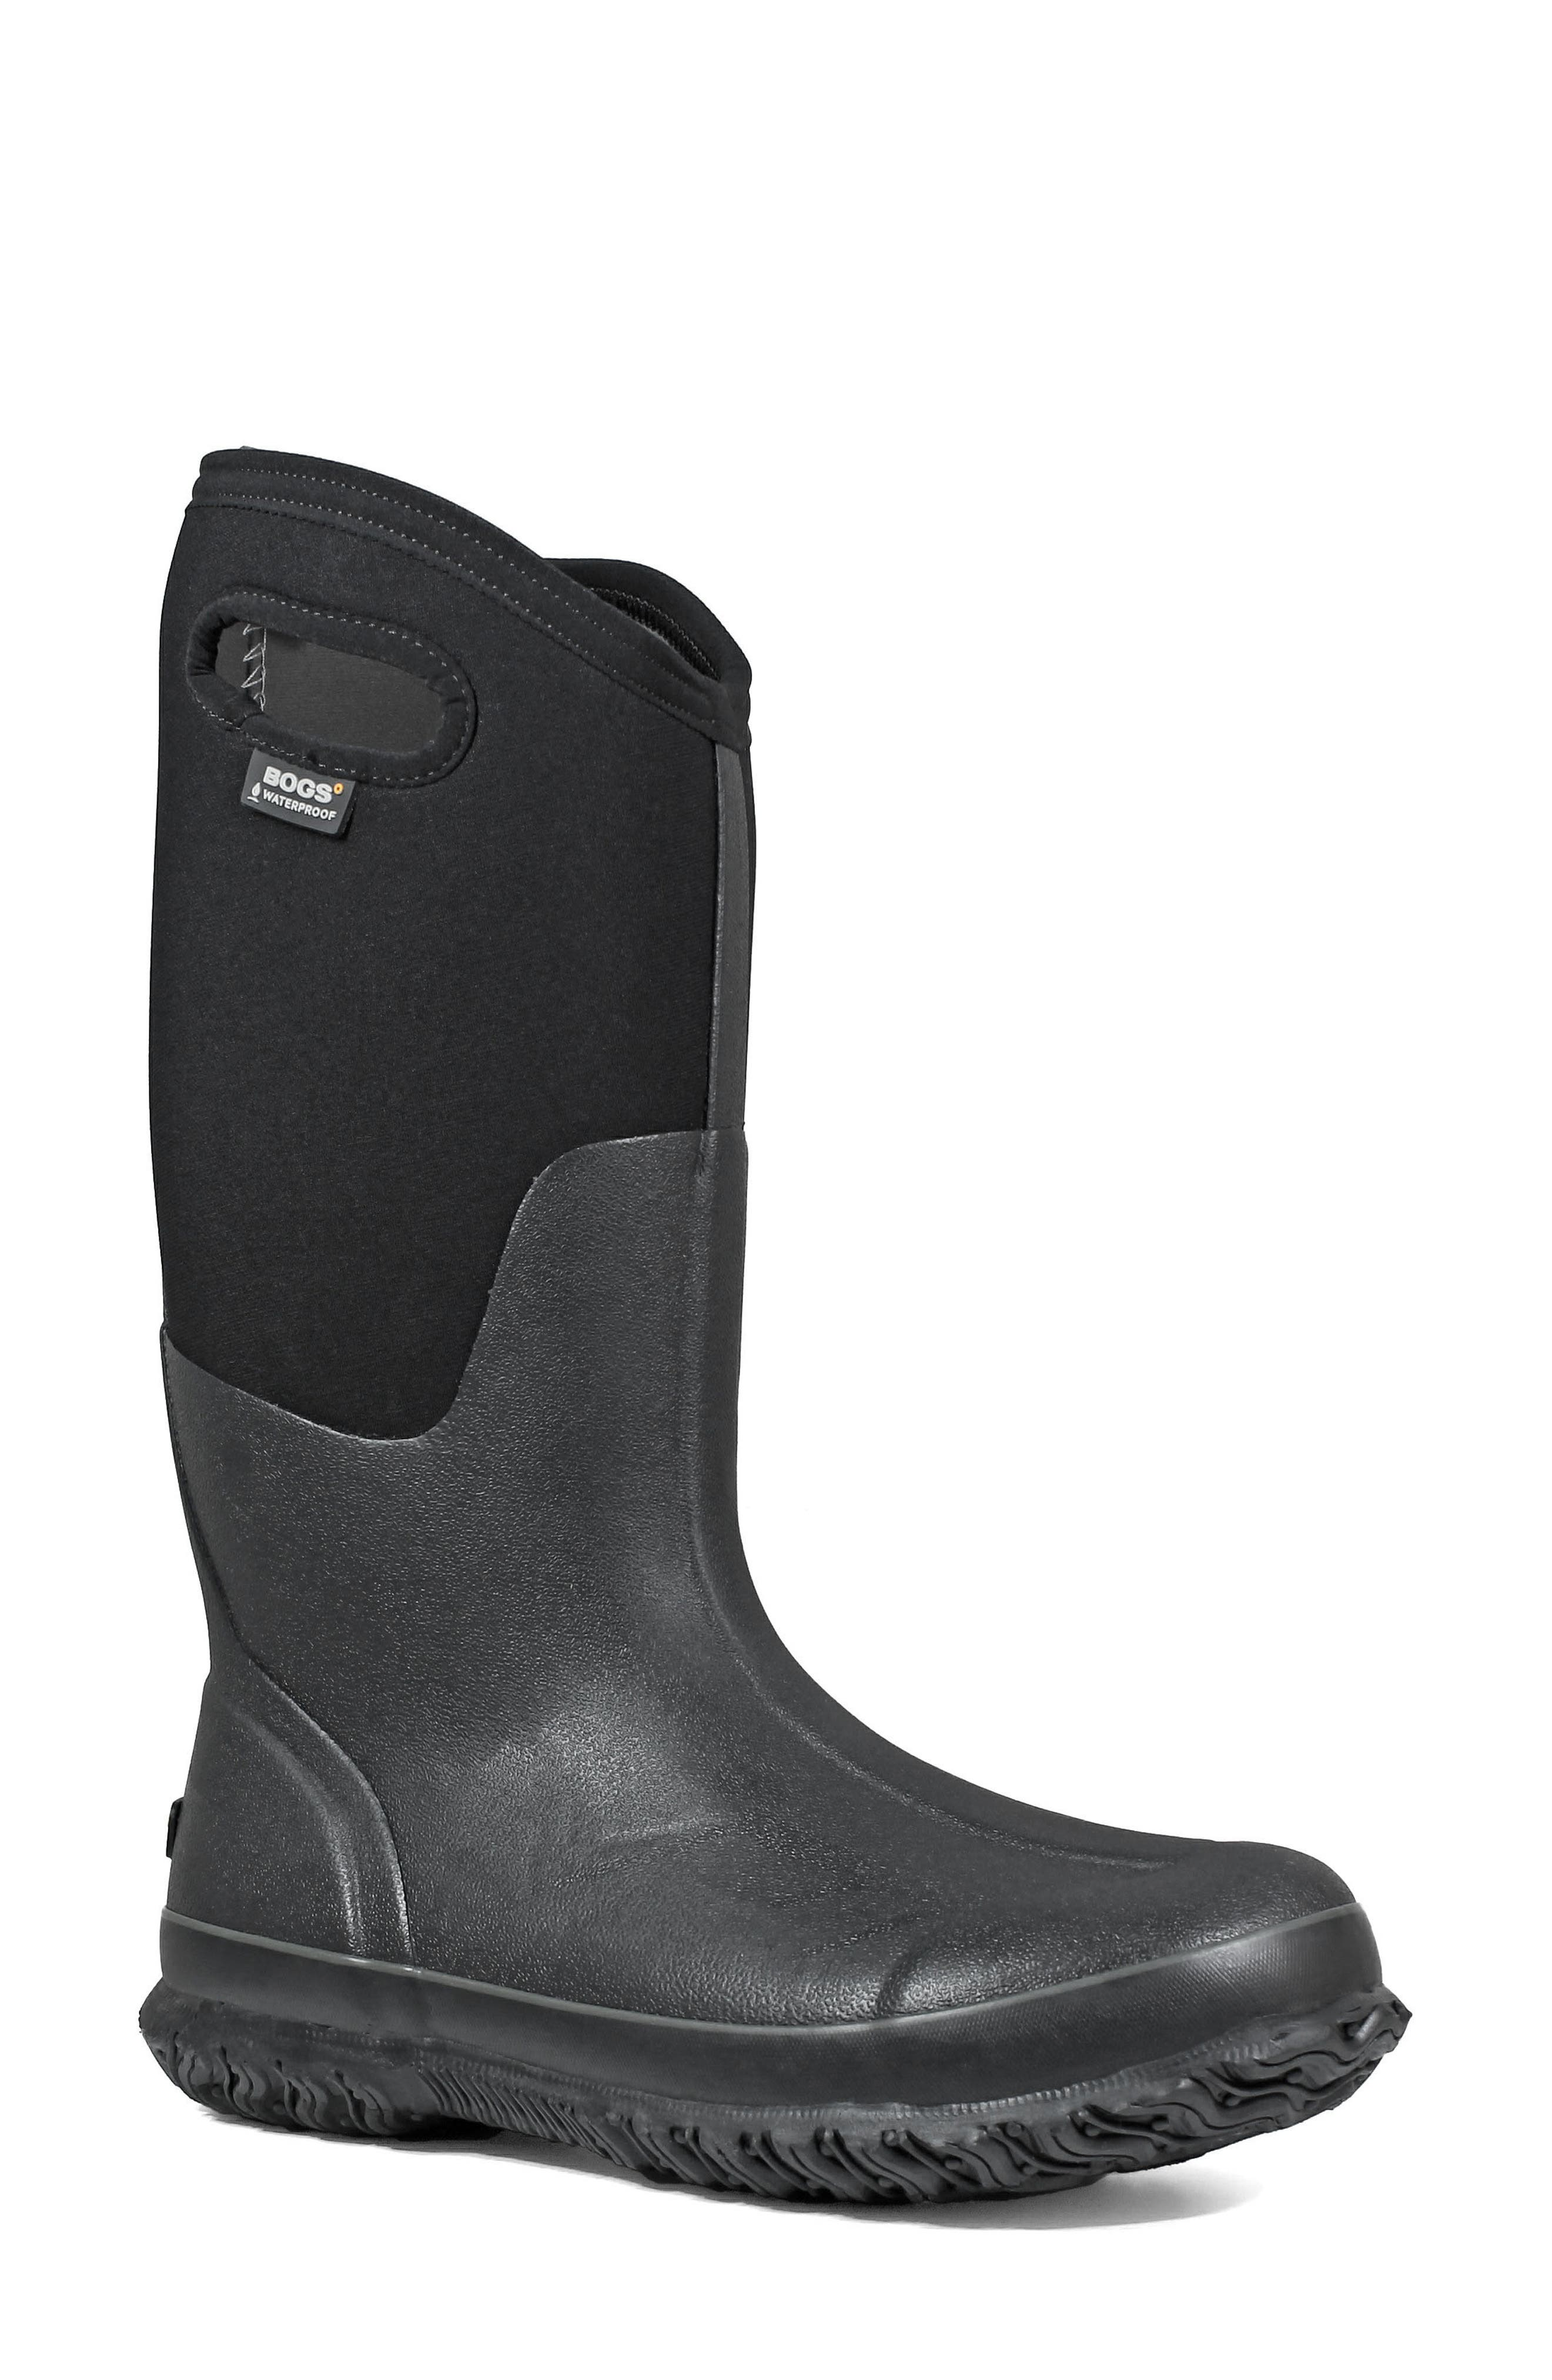 Classic Tall Waterproof Snow Boot